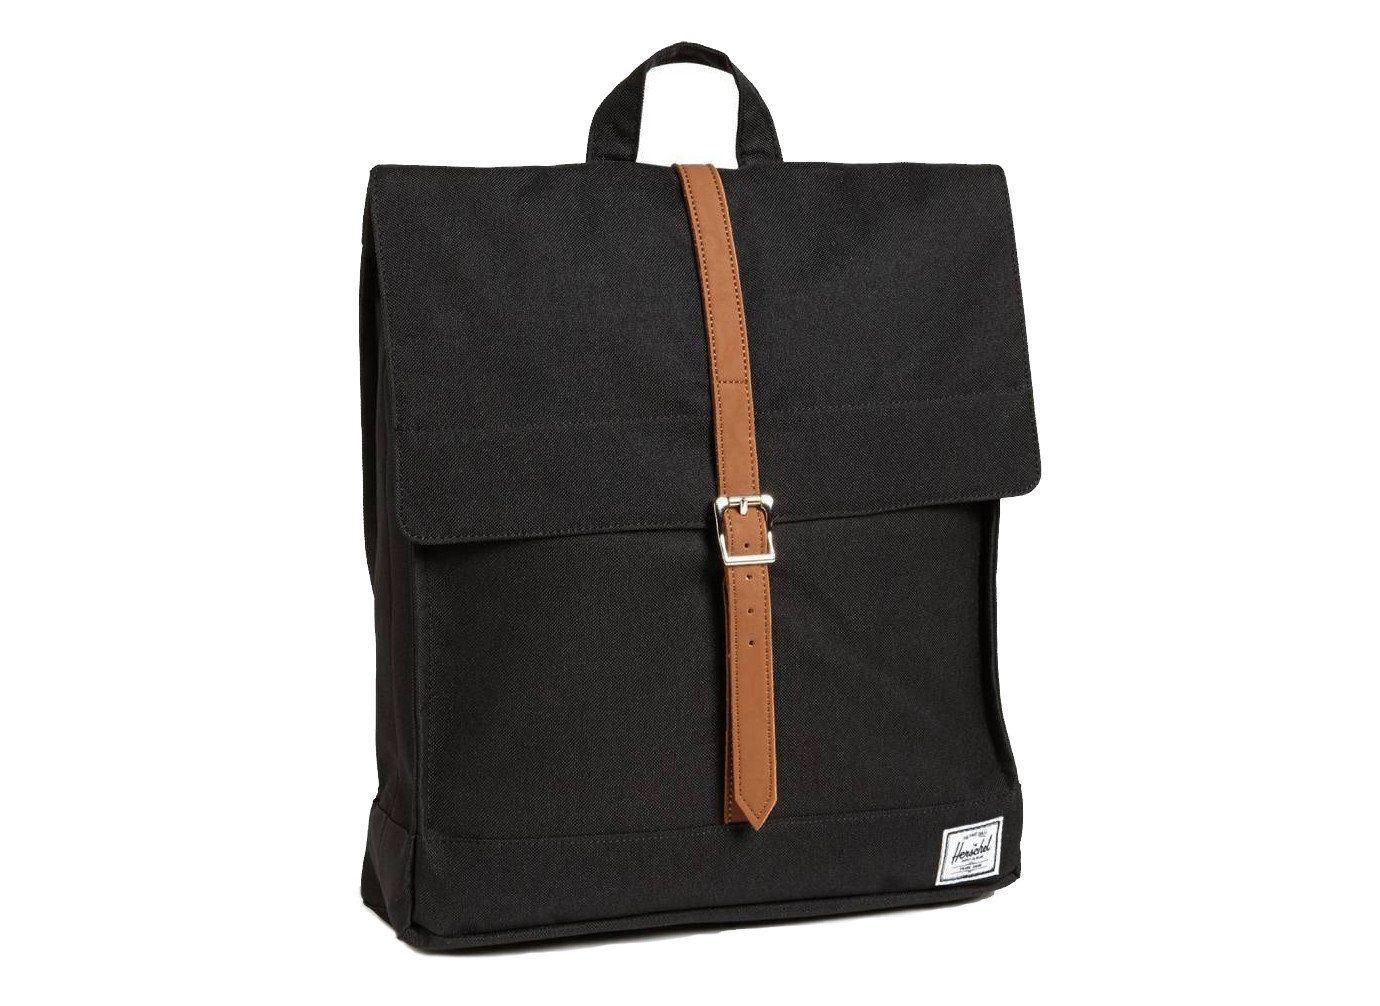 Travel Shop Travel Tips bag accessory product handbag case product design baggage shoulder bag luggage & bags brand leather hand luggage